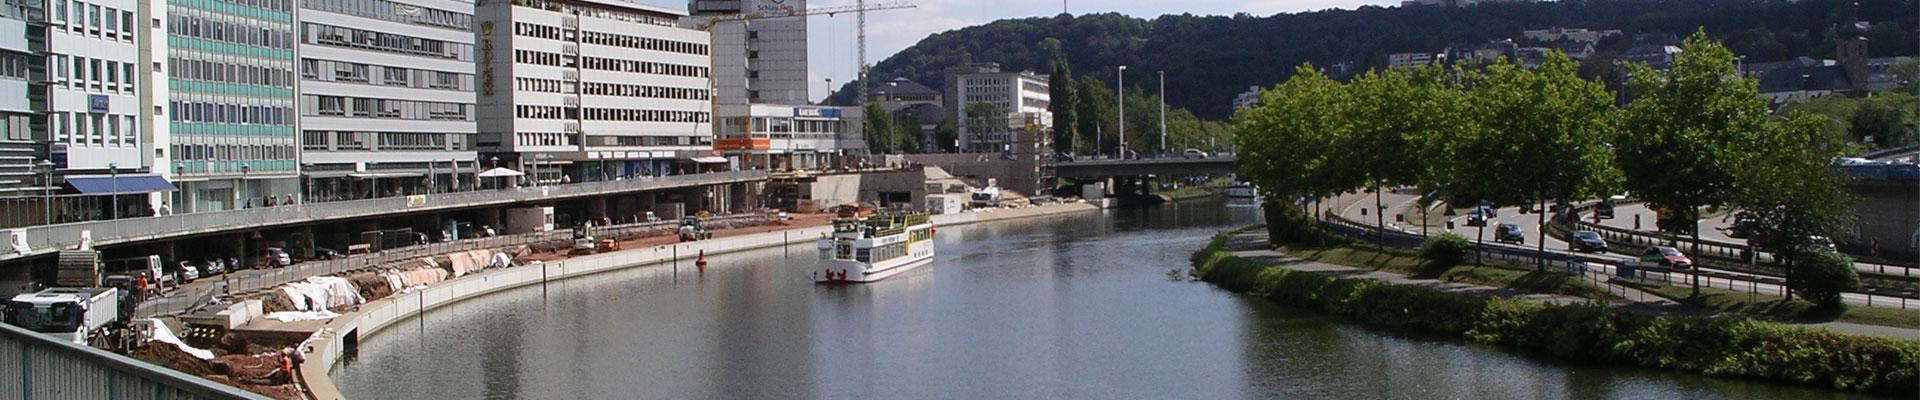 berner* Sachverständige saarbruecken-header Saarbrücken